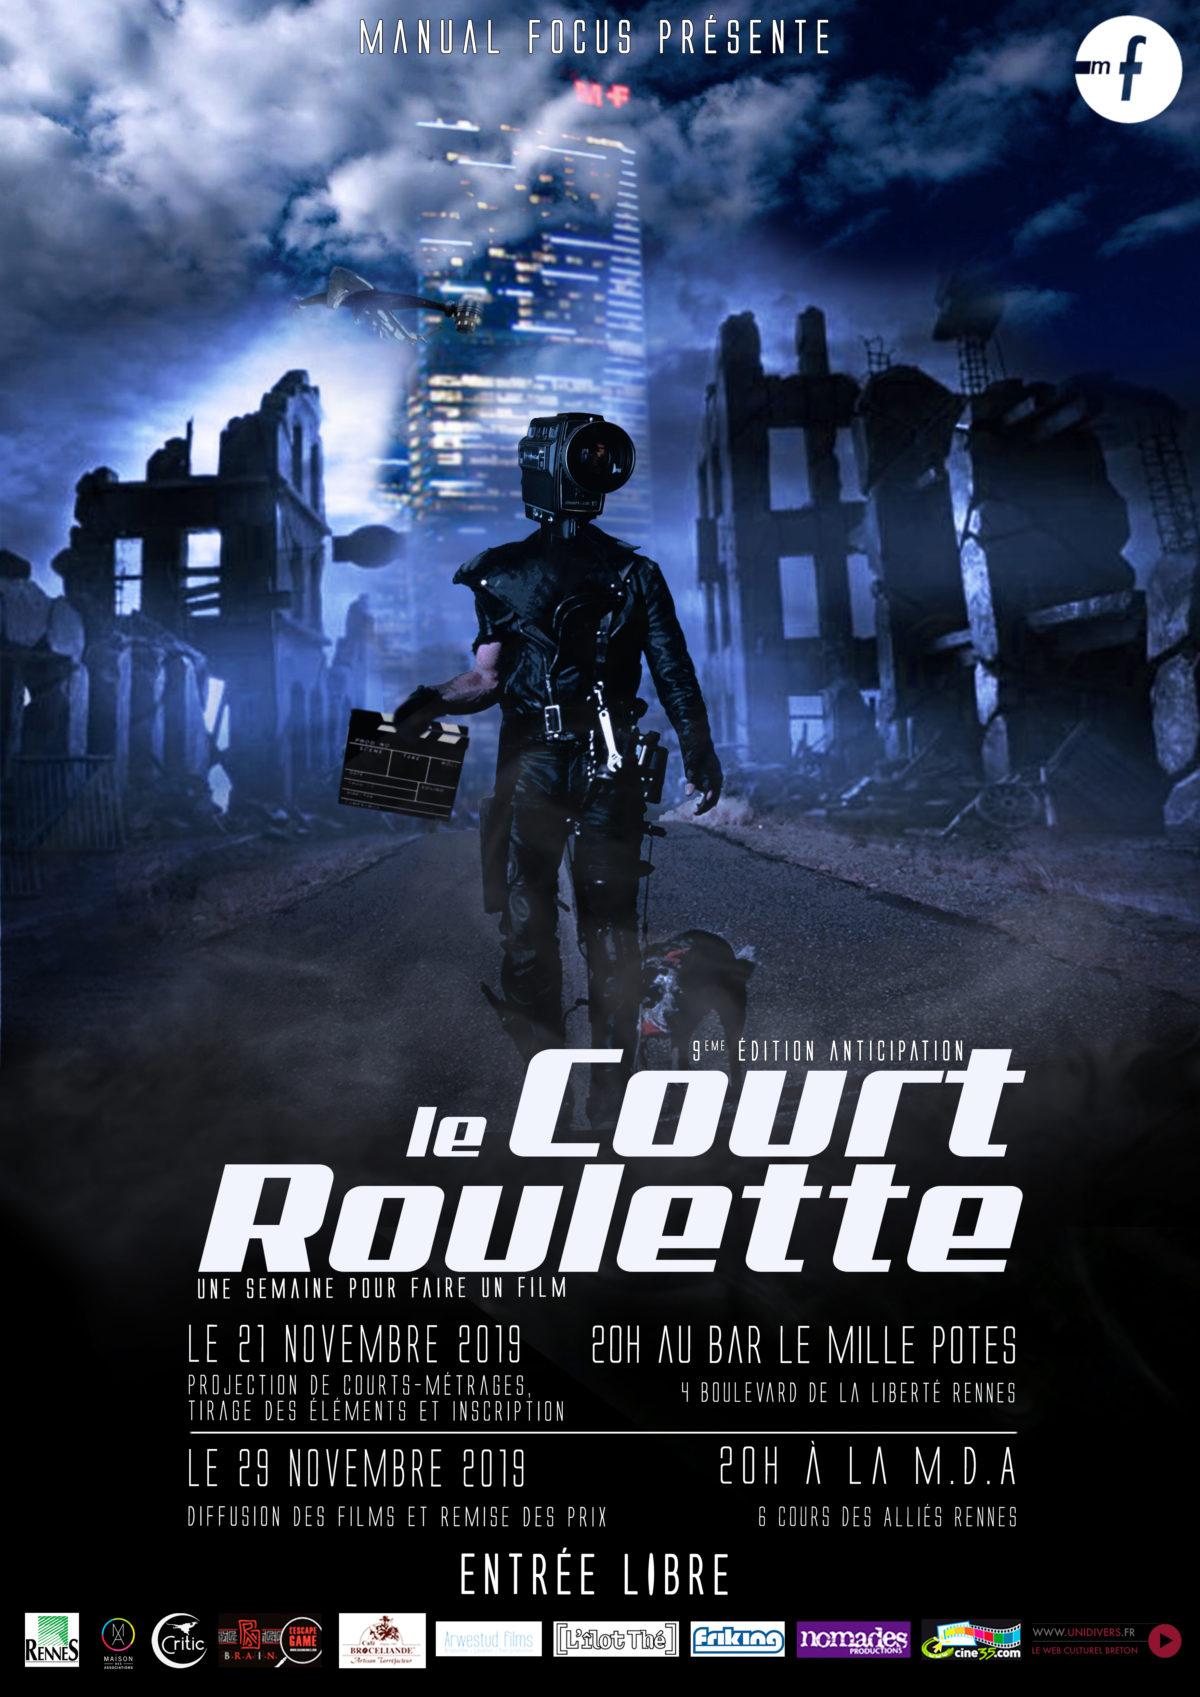 Court Roulette 9e edition